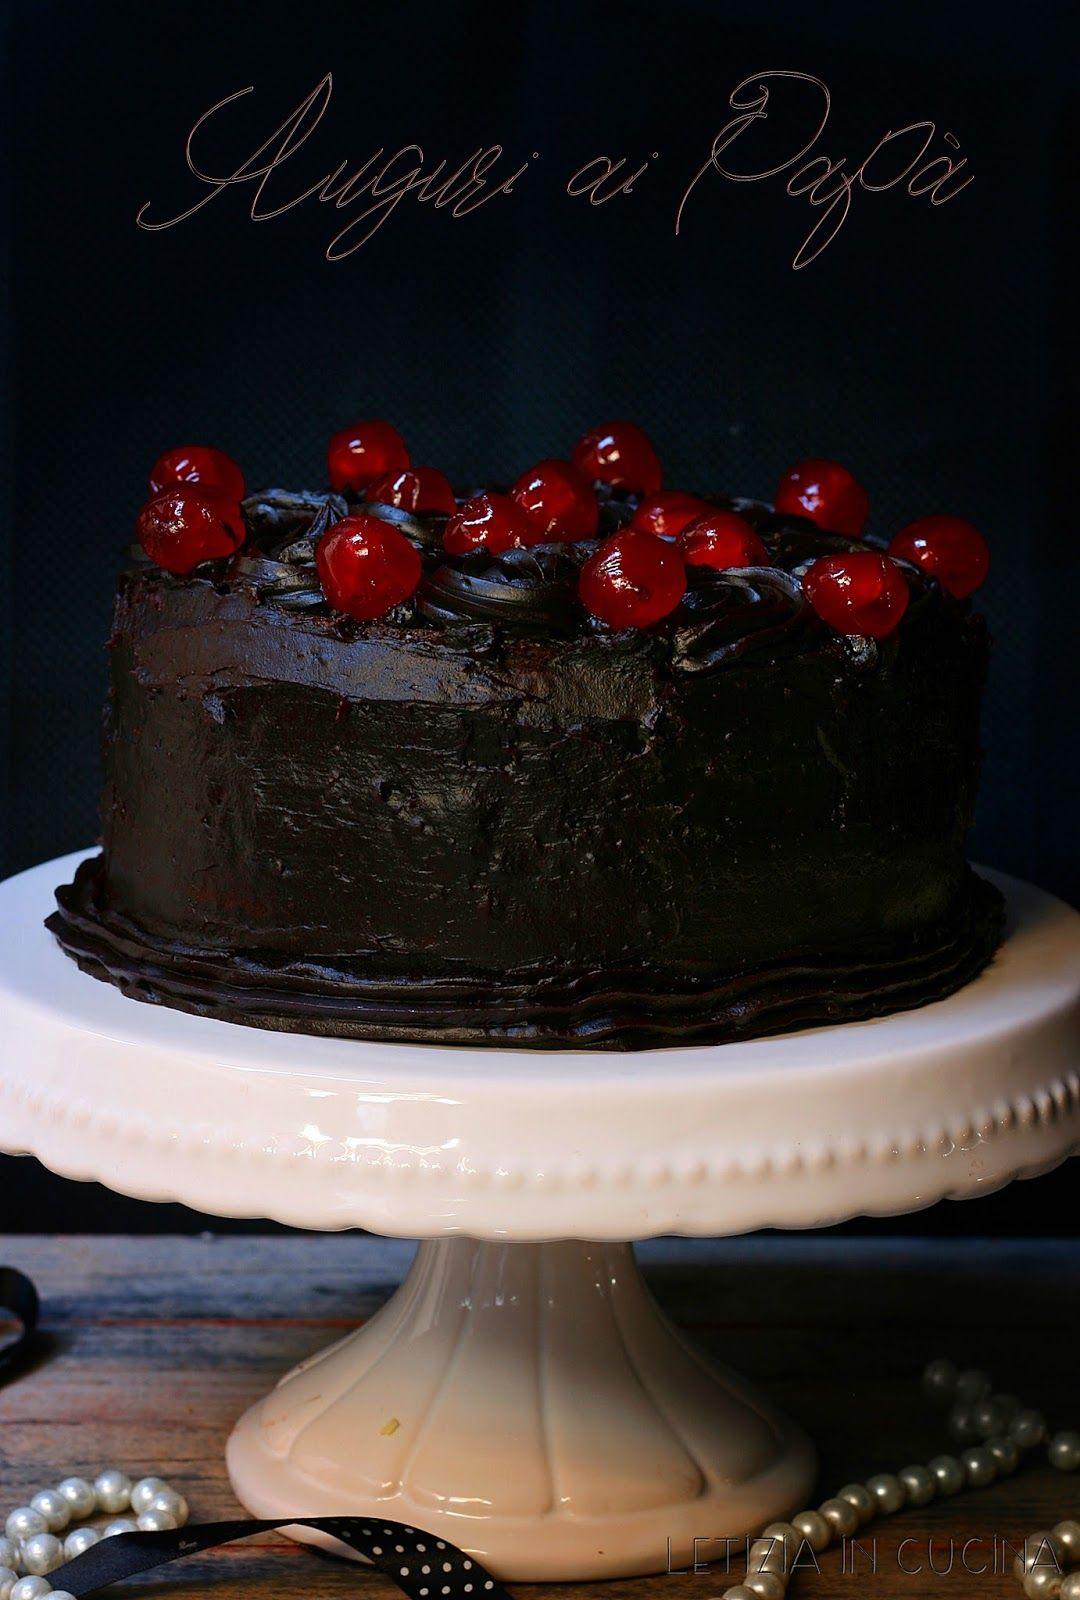 Letizia in Cucina: Simil Black out cake | I miei dolci | Dolci